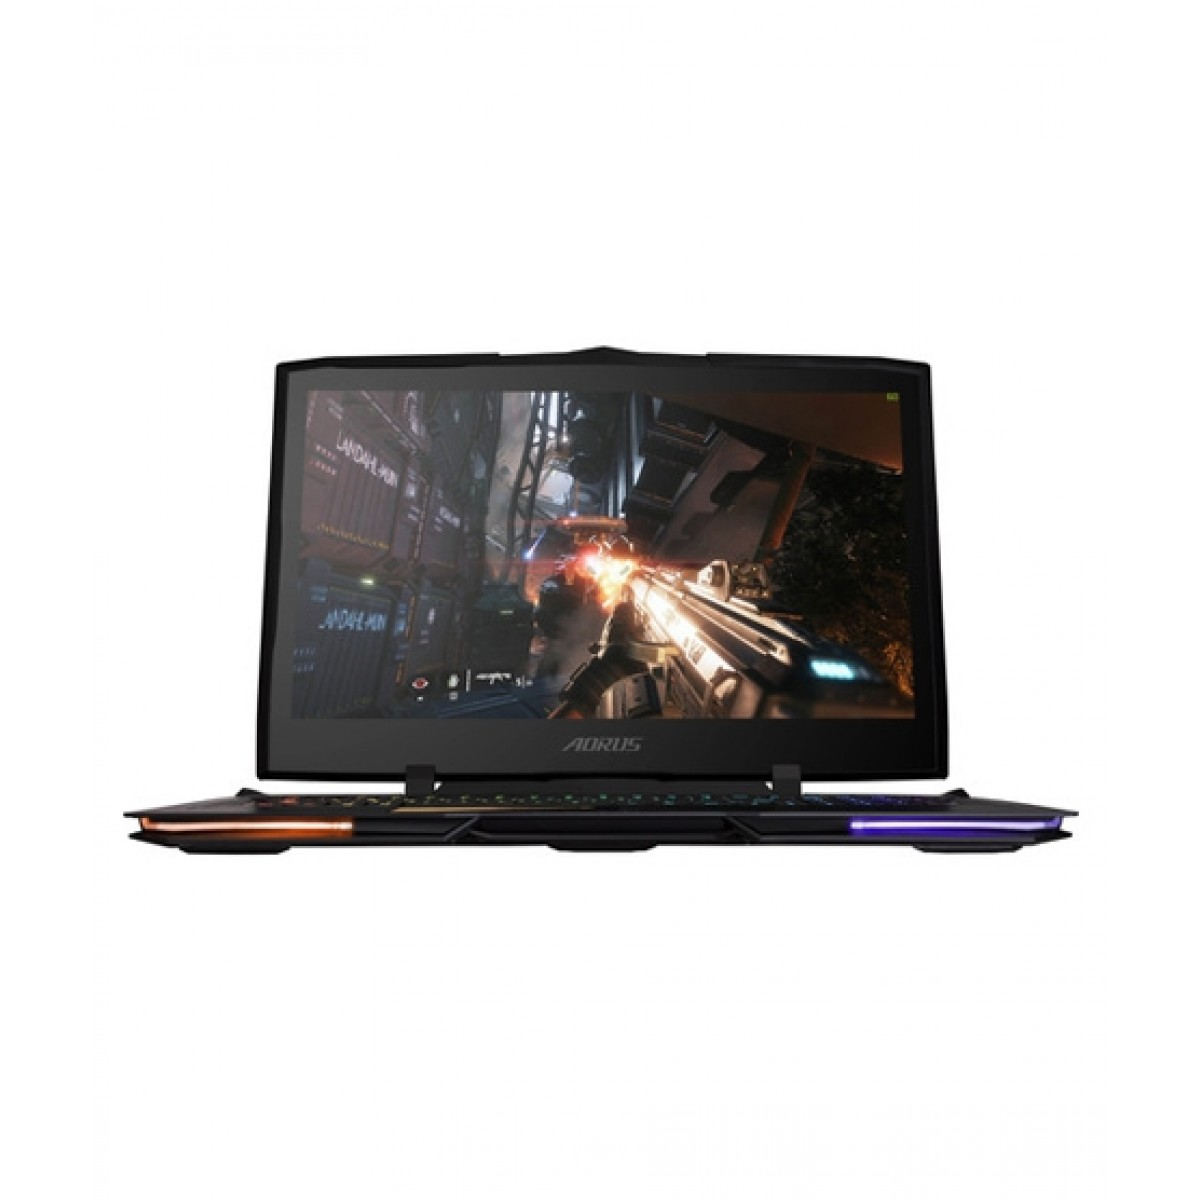 Aorus X9 Dt 17 3 Core I9 8th Gen Gaming Laptop Price In Pakistan Buy Aorus 17 3 Core I9 Geforce Gtx 1080 Laptop X9 Dt Cl5m Ishopping Pk